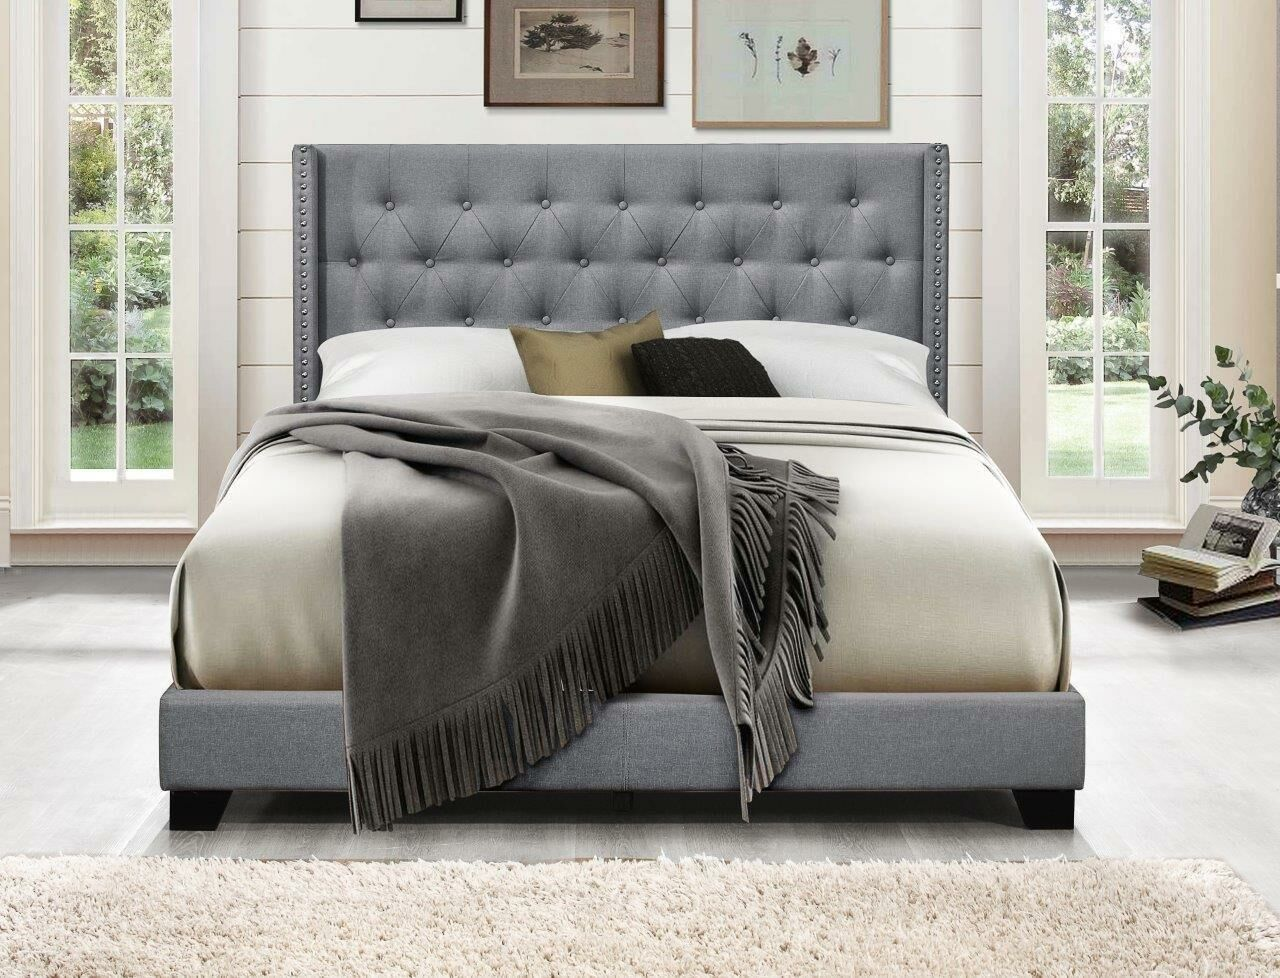 Camren Upholstered Panel Bed Color: Light Gray, Size: Queen